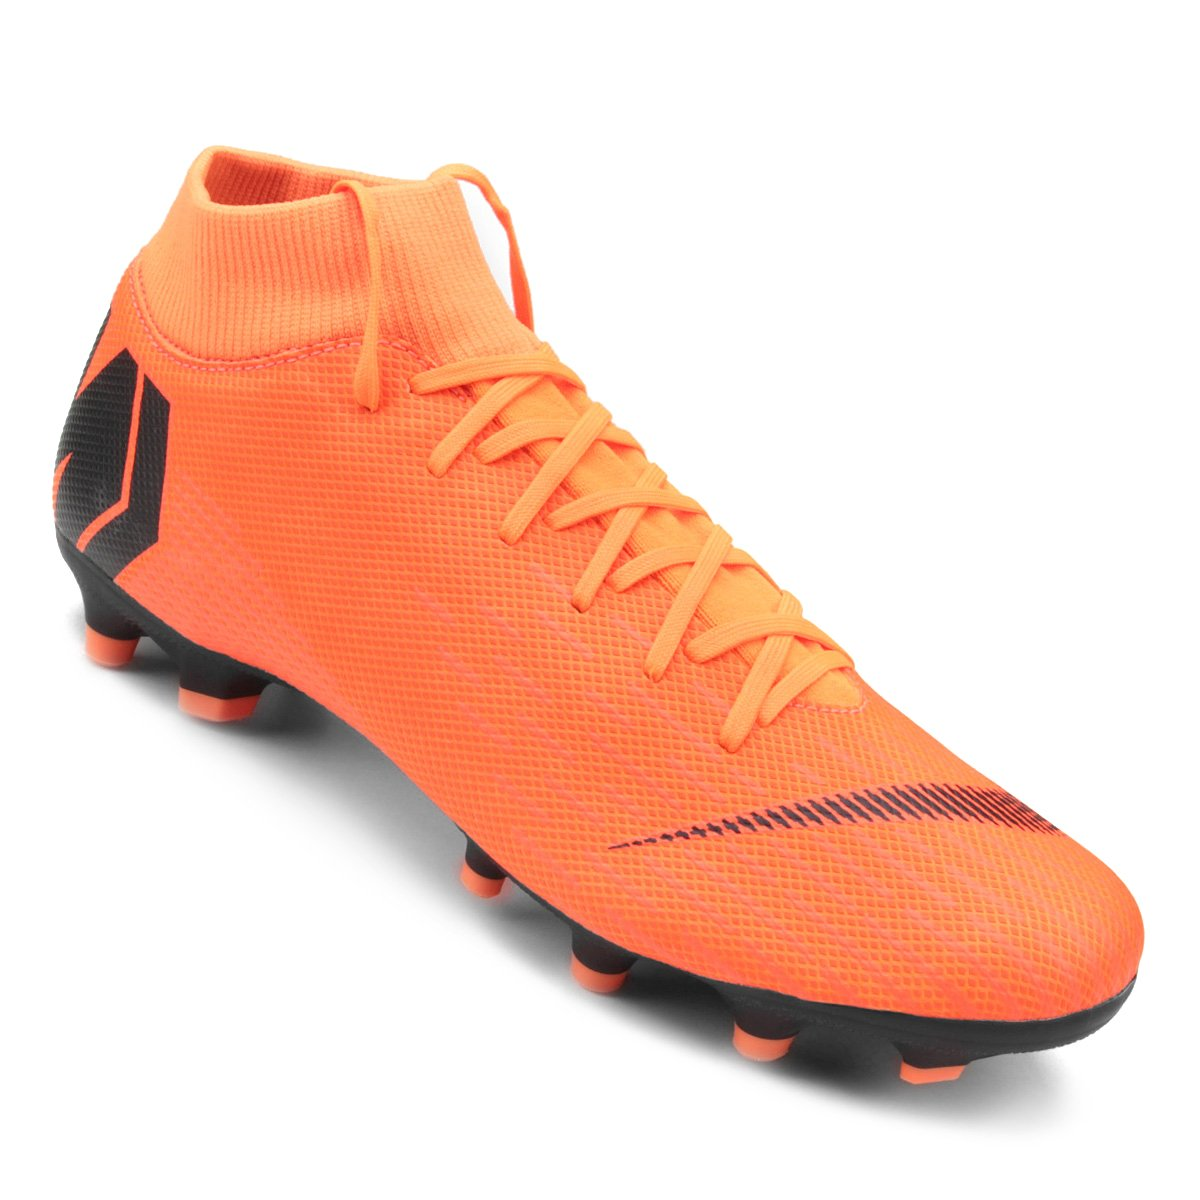 Chuteira Campo Nike Mercurial Superfly 6 Academy - Laranja e Preto ... 7fa73def6827d